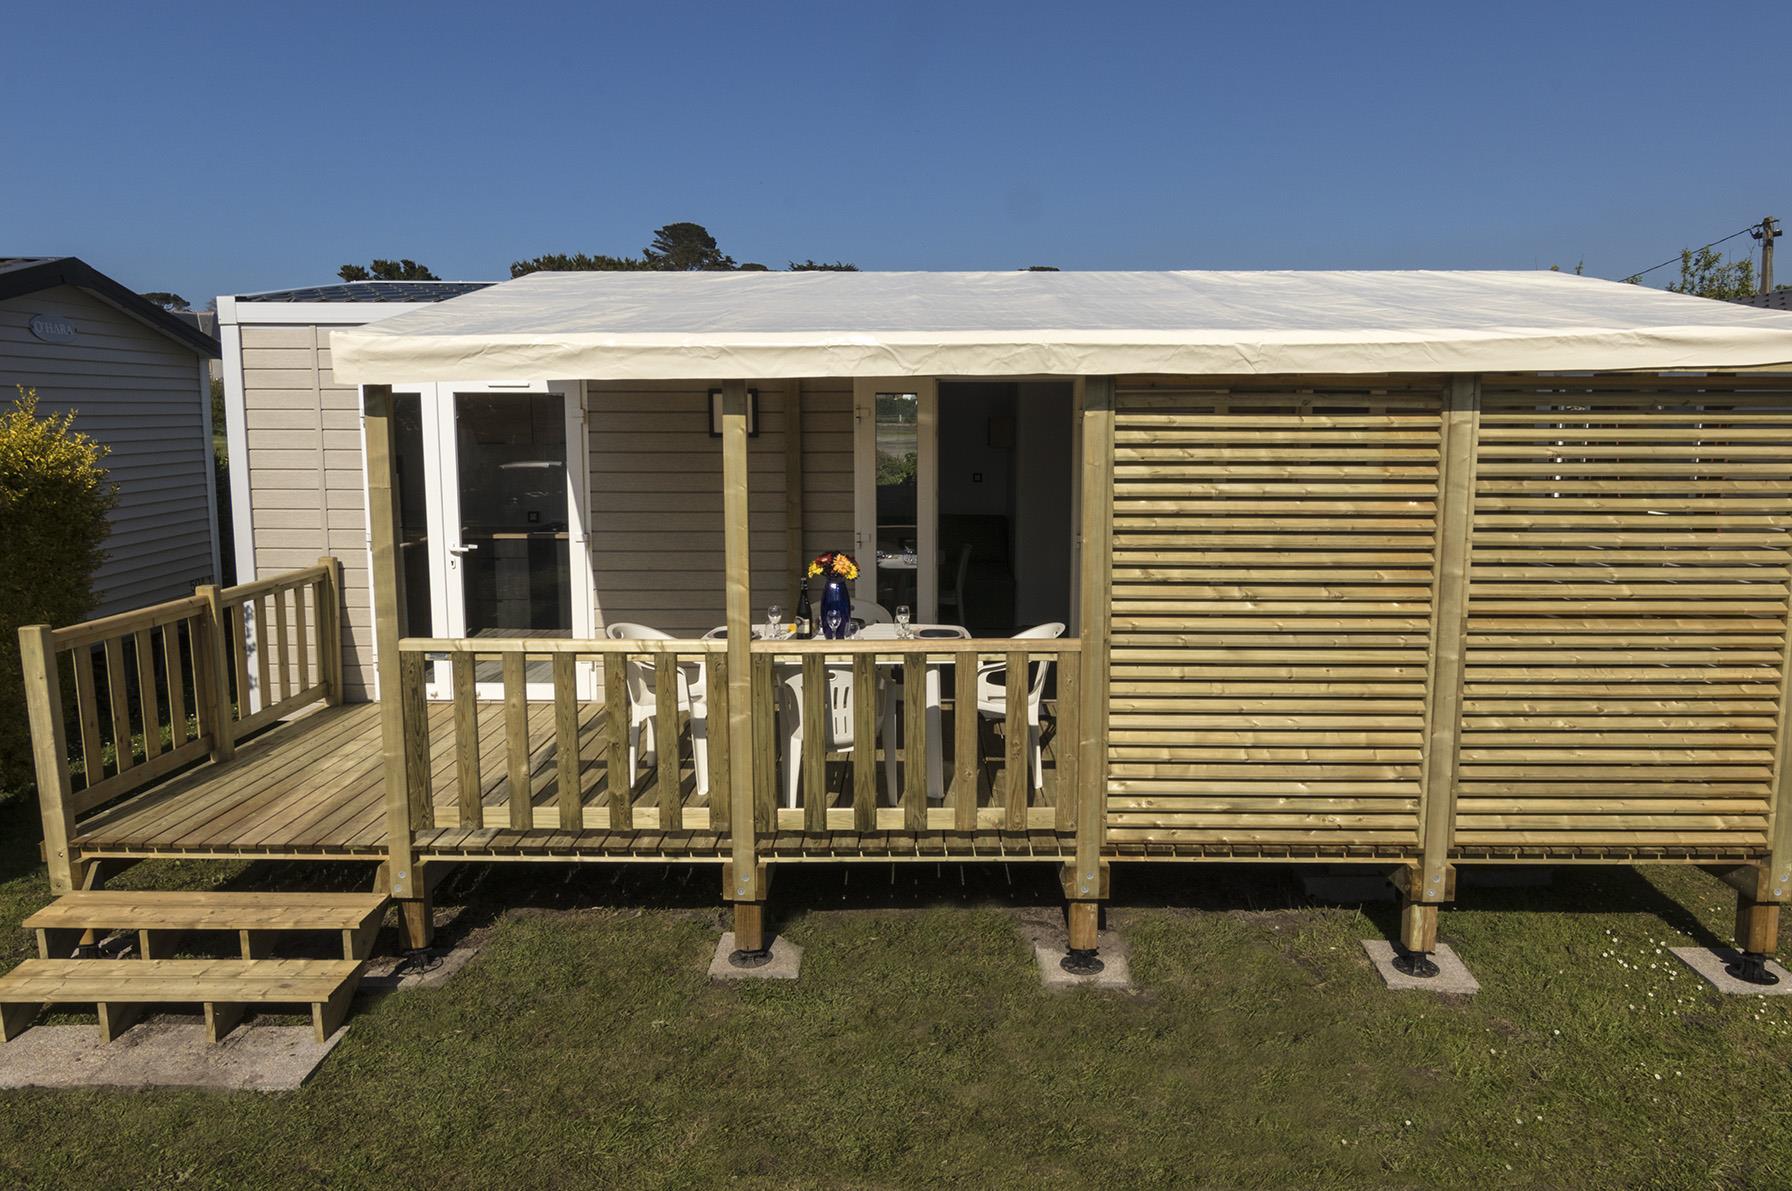 Location - Mobilhome Prestige 30M² - 2 Chambres - Terrasse Couverte - Spa - Lave Vaisselle - Wifi - Camping Le Mat